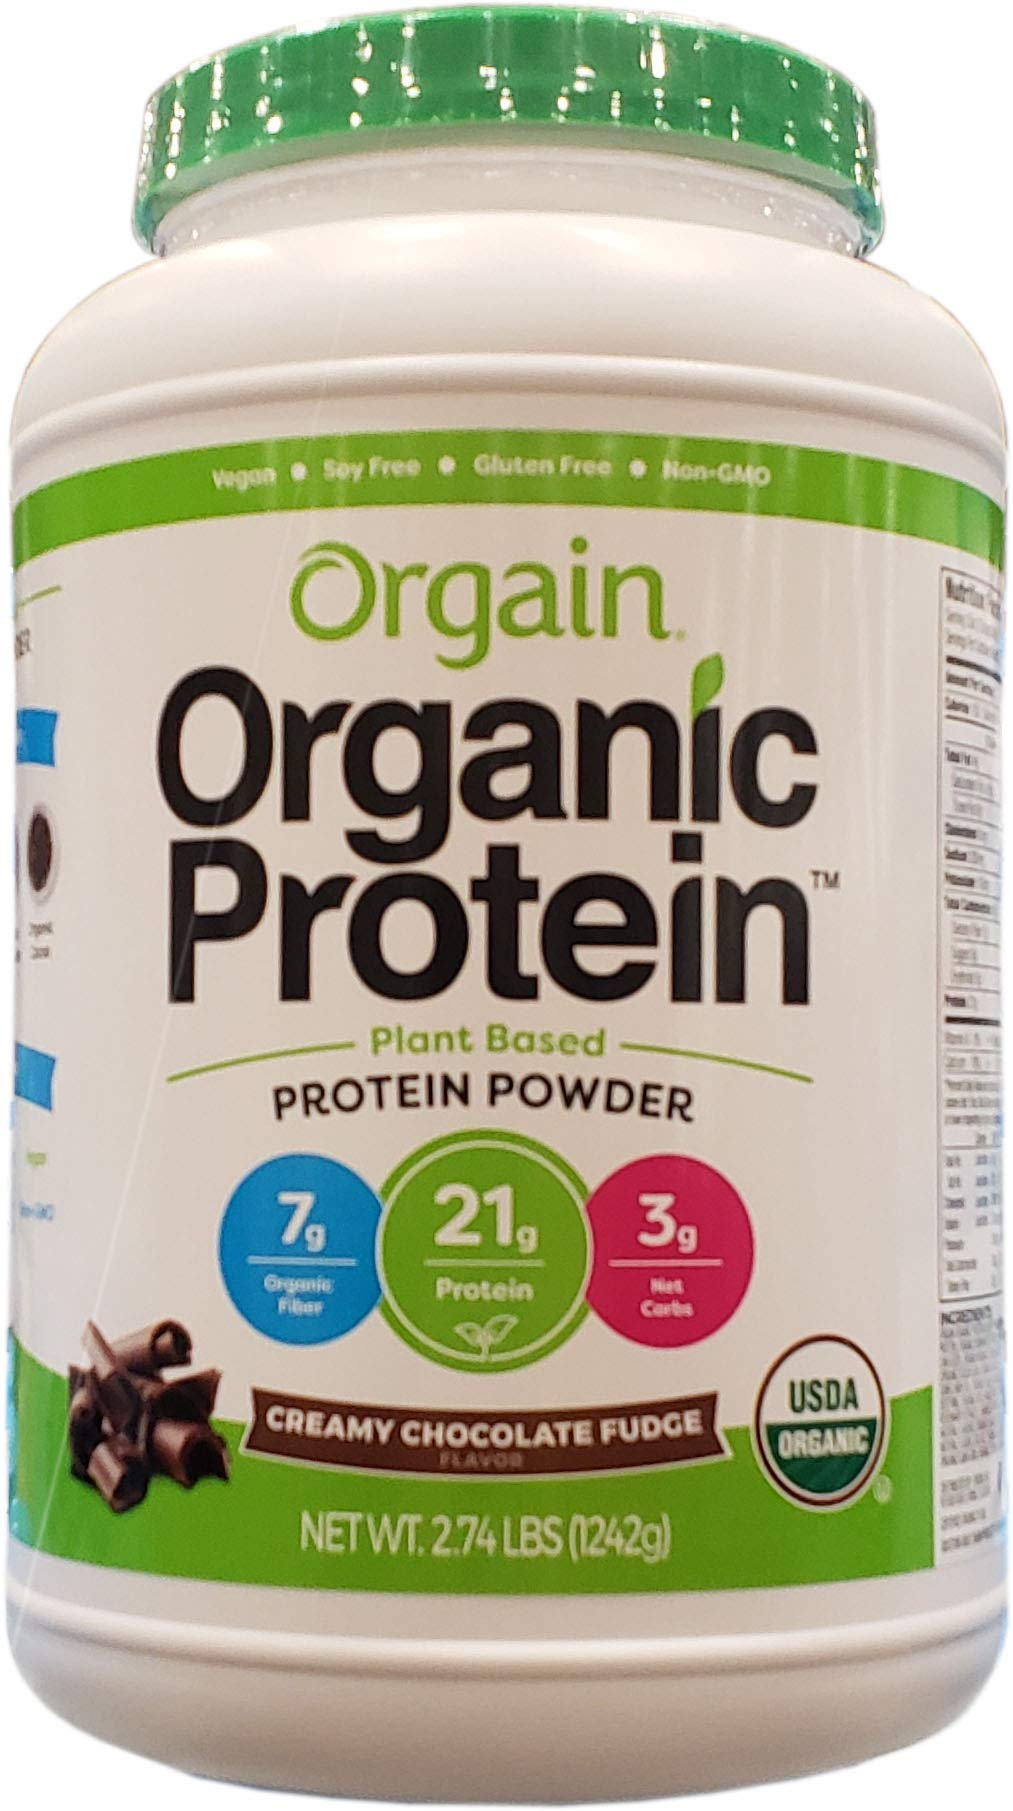 Orgain Organic Plant-Based Protein Powder, Creamy Chocolate Fudge, 2.74 Pound (0)